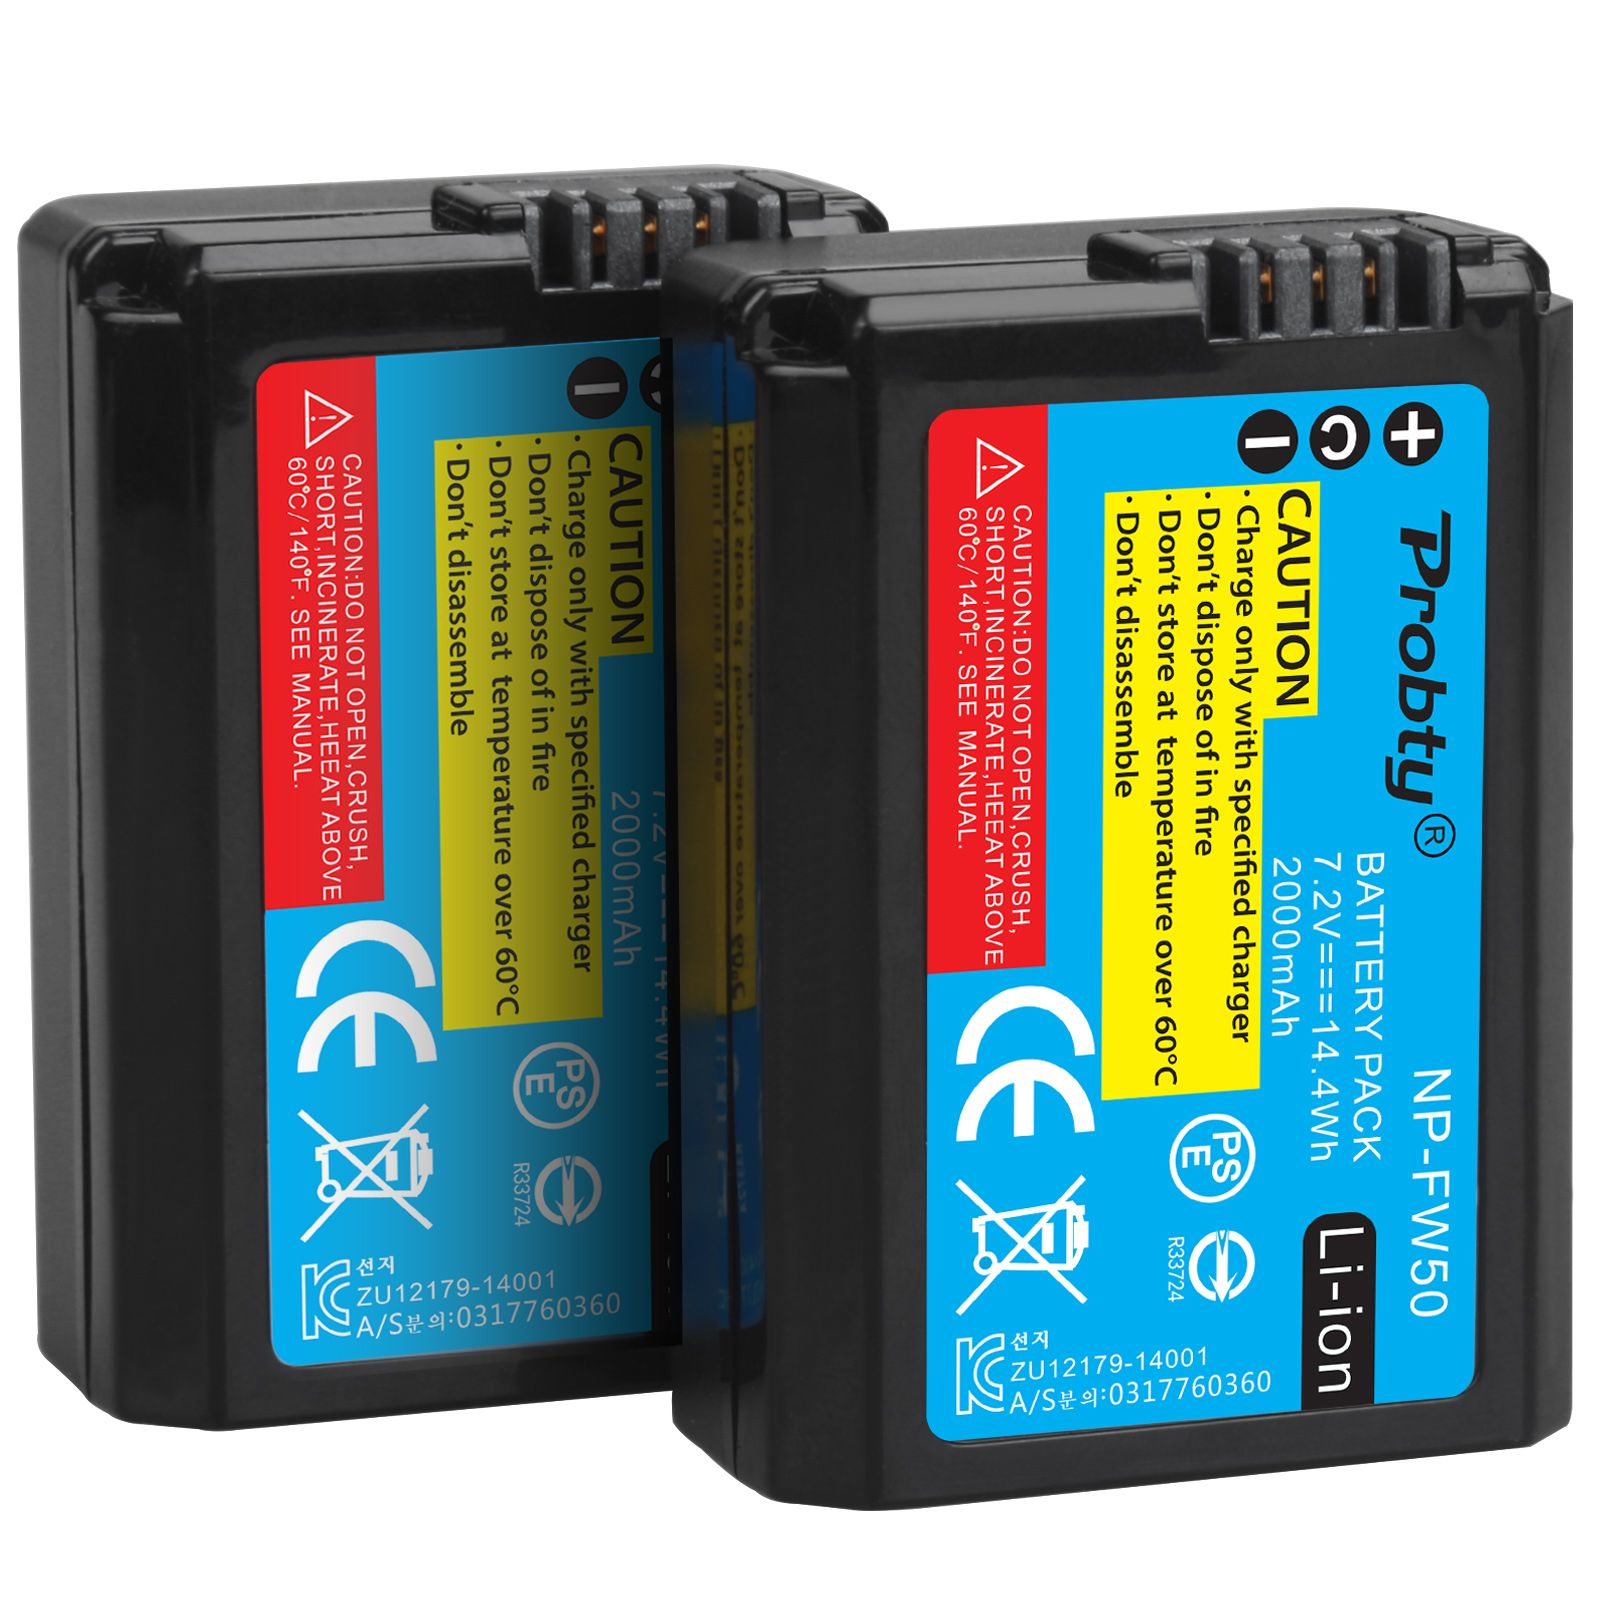 2 stücke 2000mAh NP-FW50 NPFW50 Batterie für Sony NEX-7 NEX-5N NEX-F3 SLT-A37 A7 NEX-5R NEX-6 NEX-3 NEX-3A Alpha 7R II Kamera